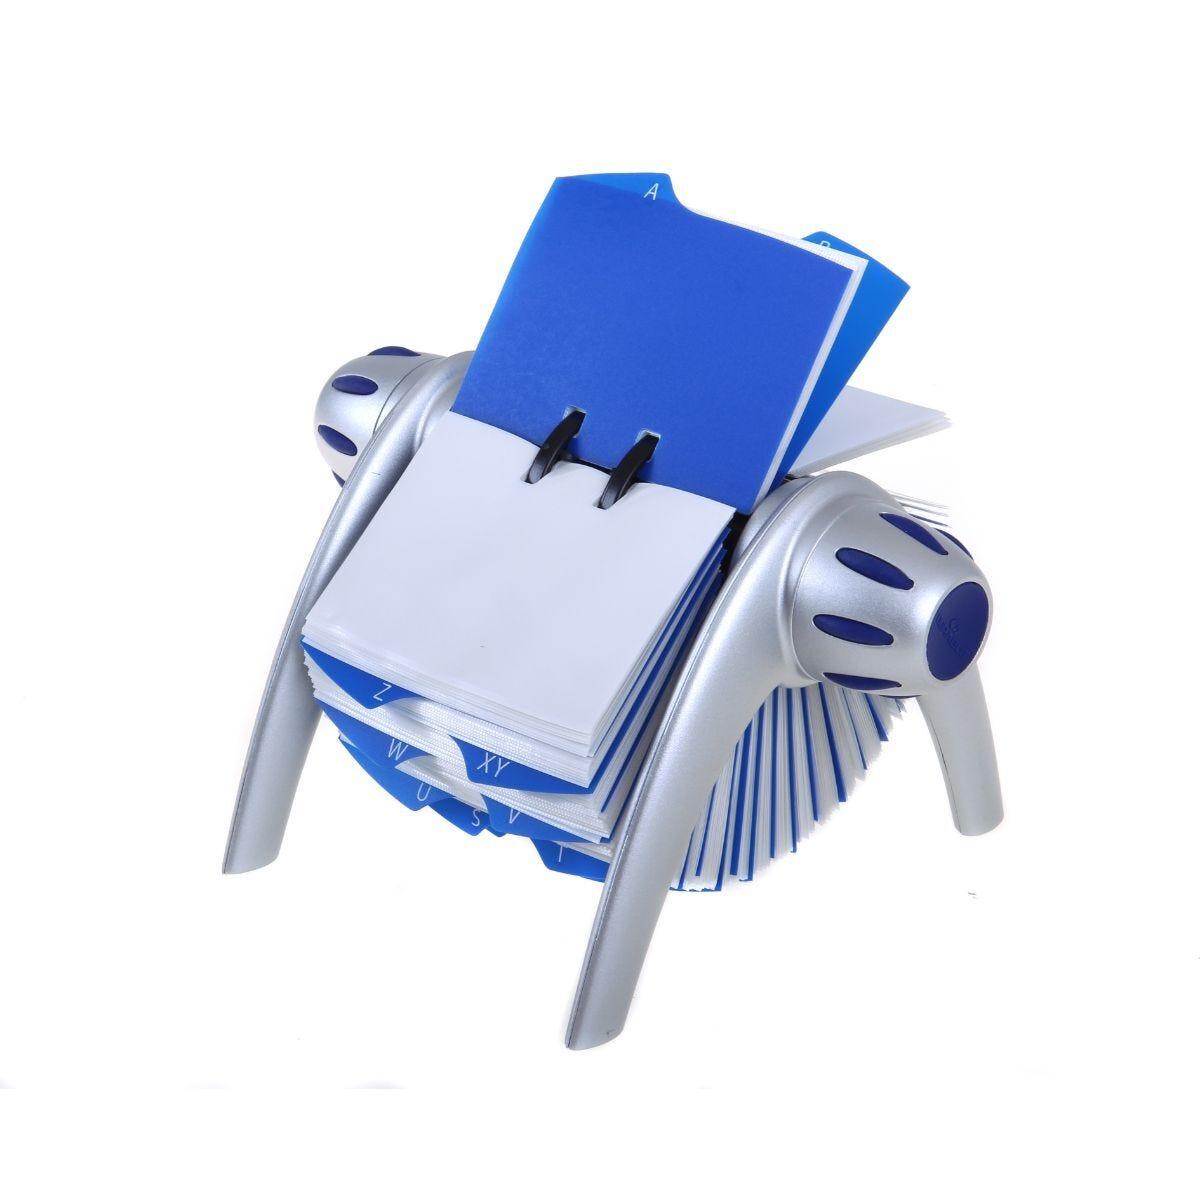 Visifix Flip Rotary File Business Card Holder